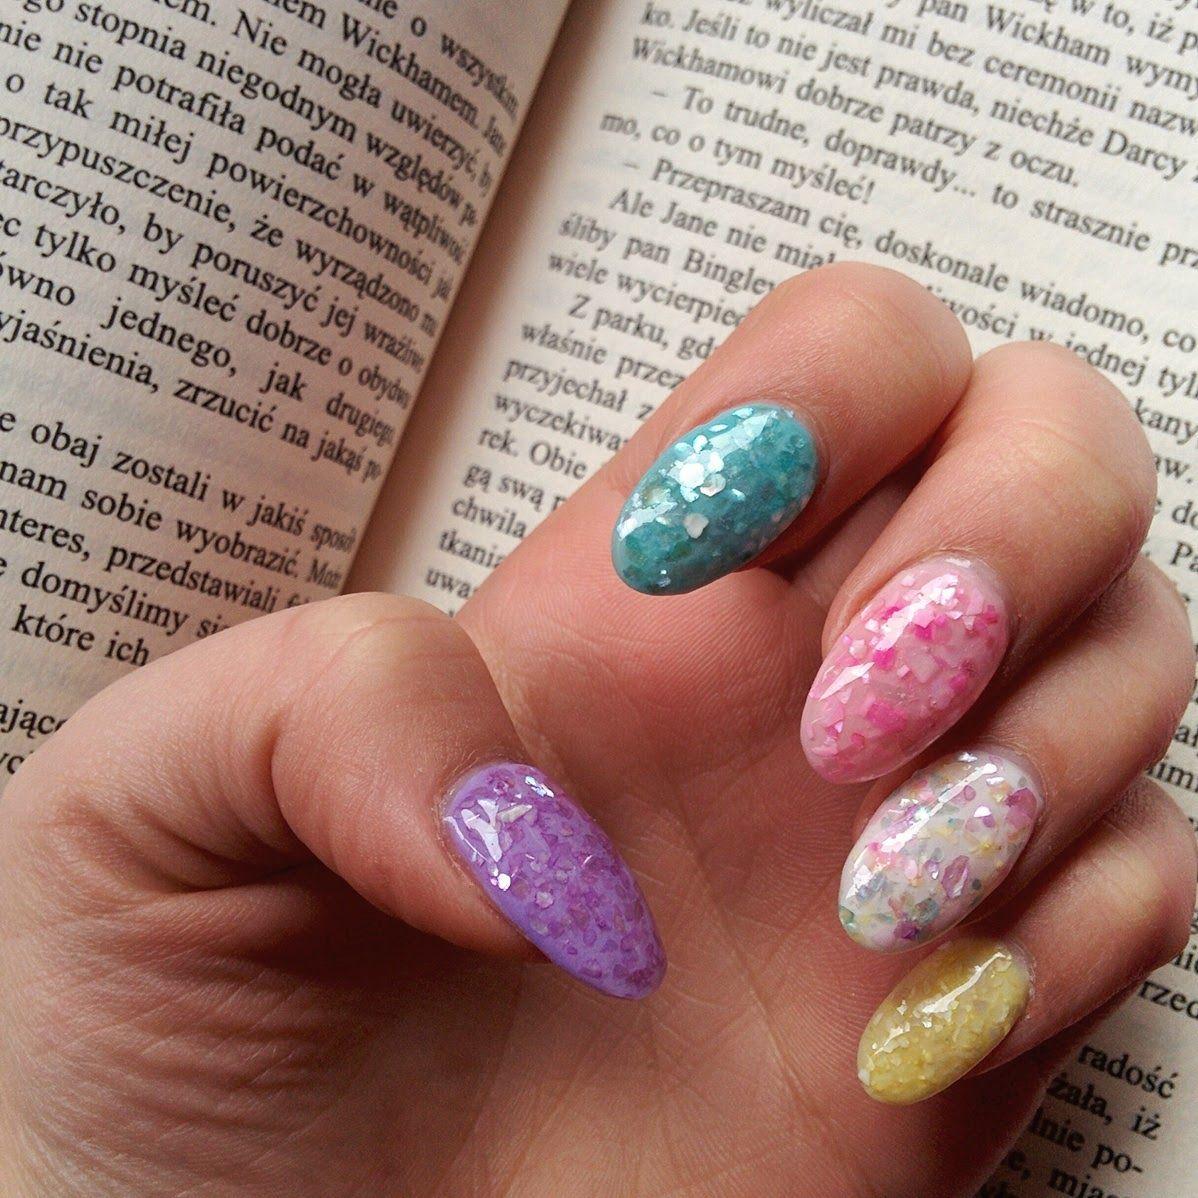 Guest Nail Art 20 - Best Nail Art Designs Gallery | Modern nails ...